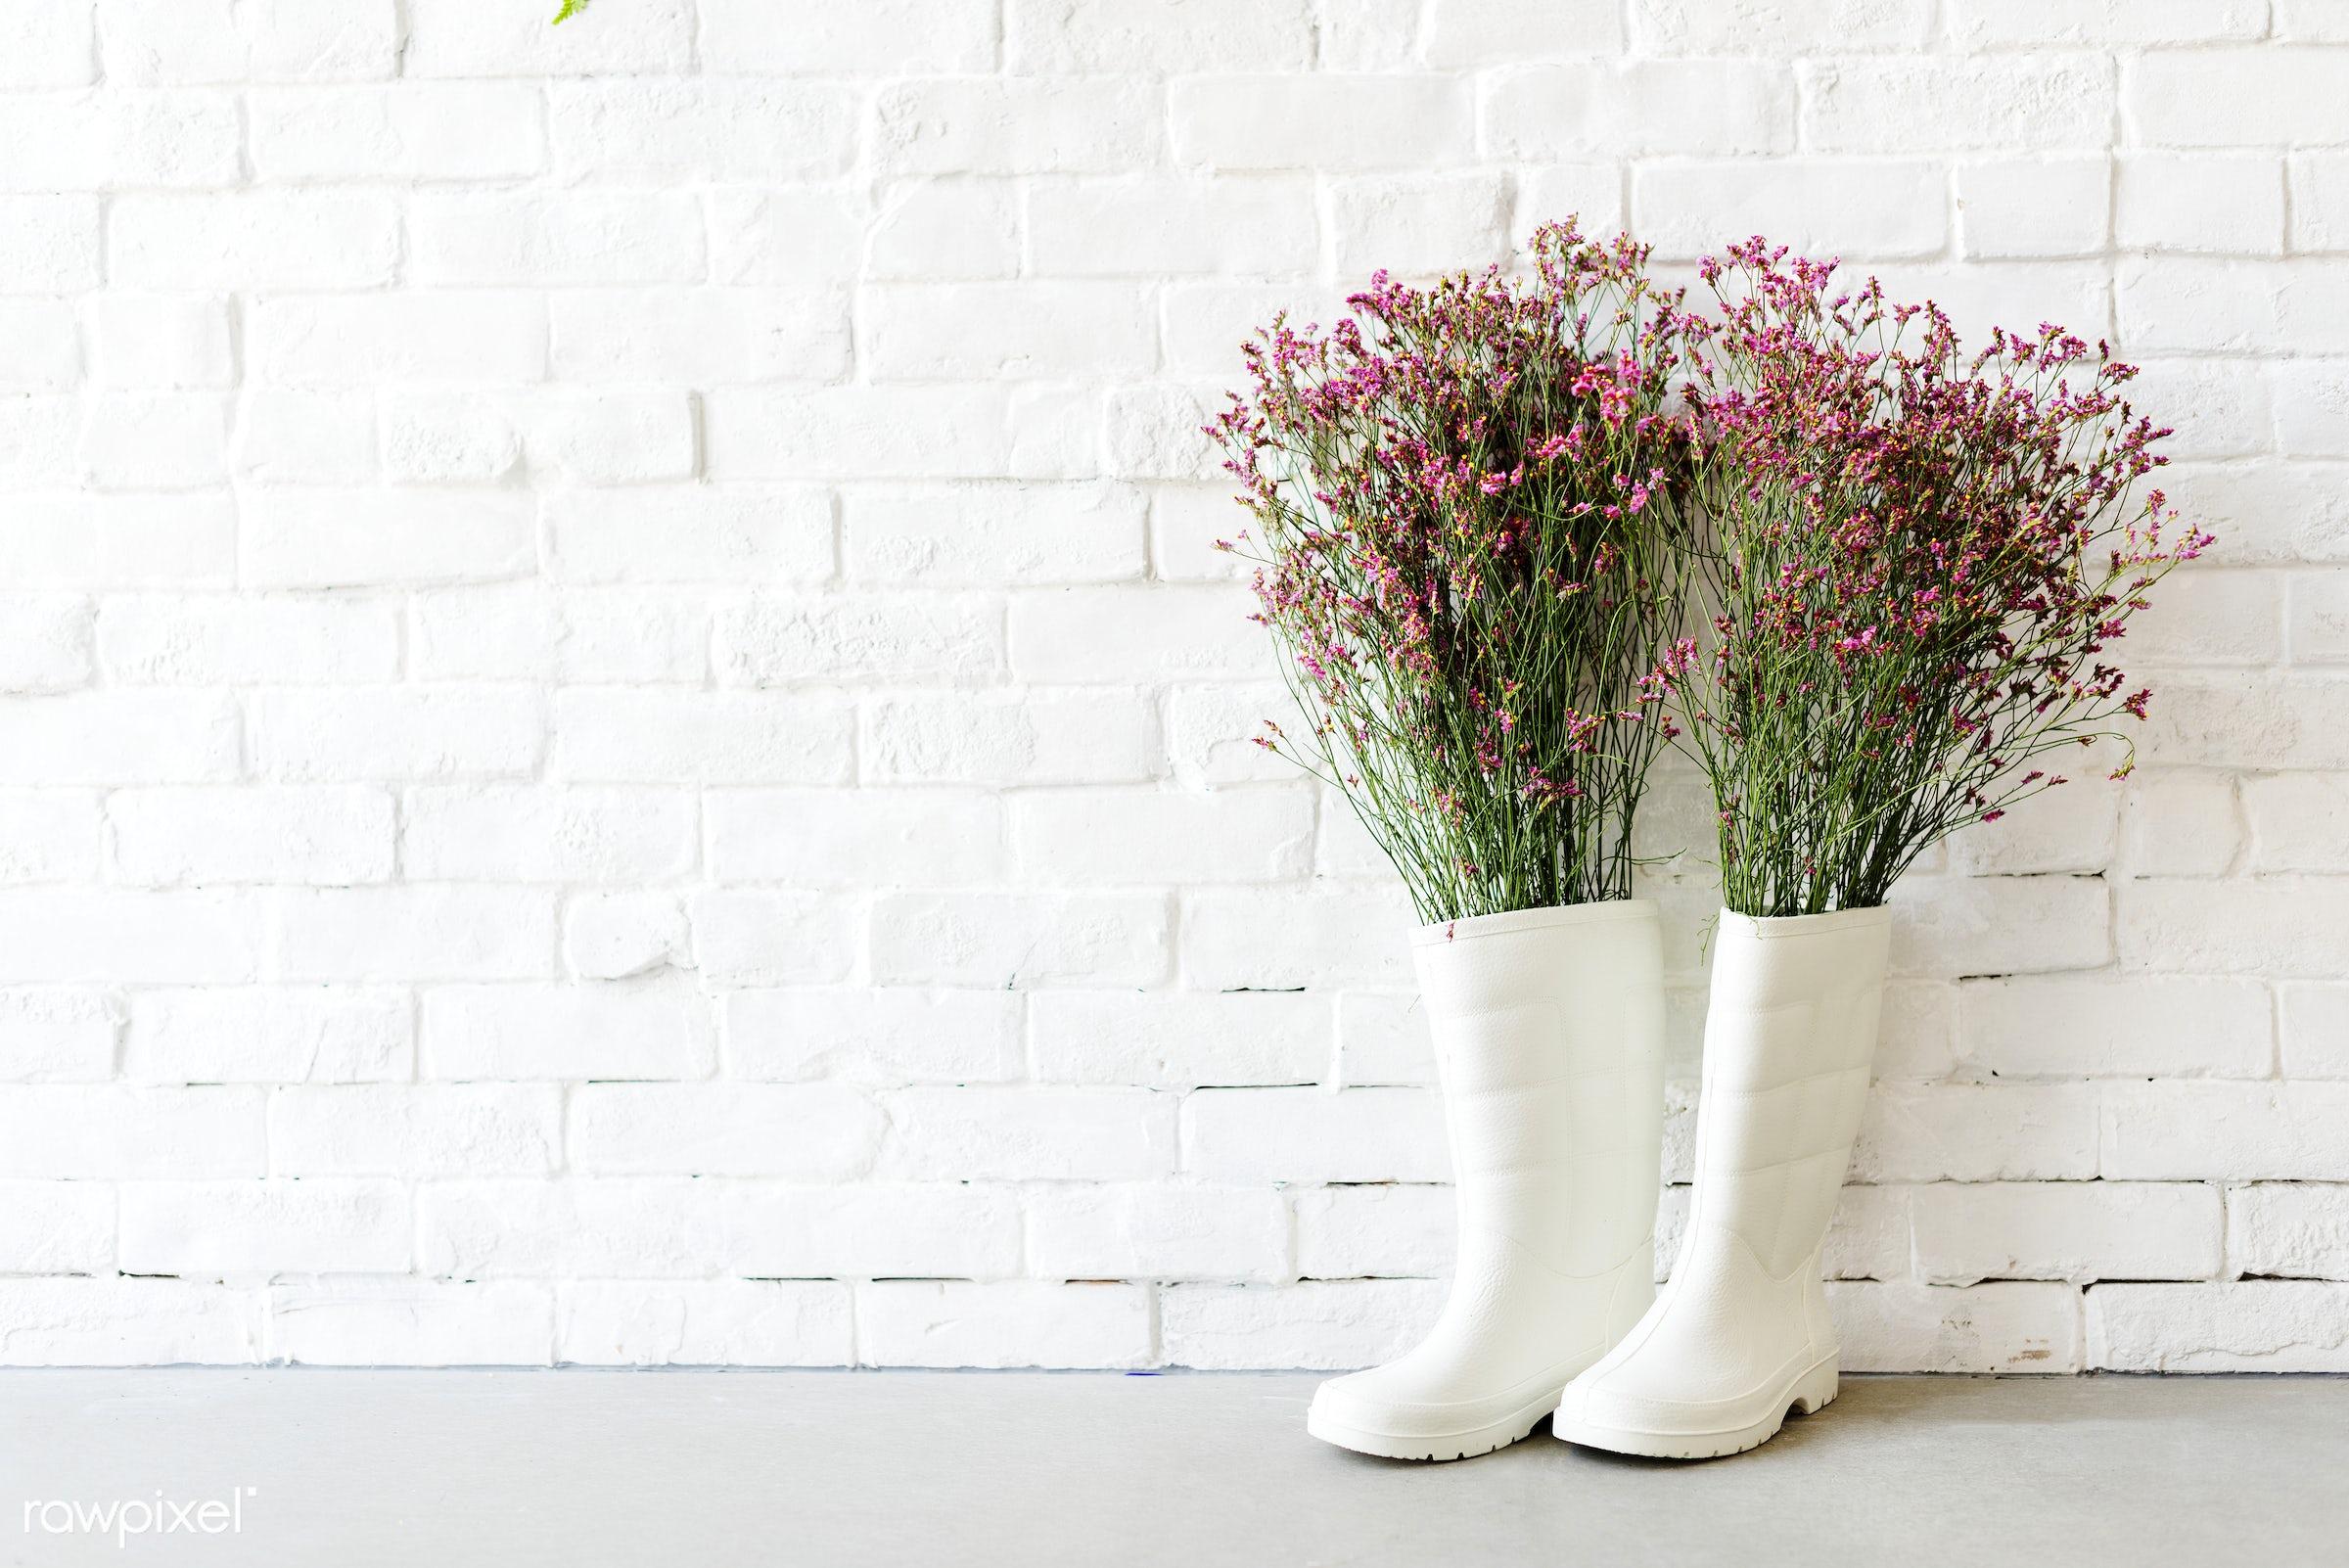 spring, gardening, flower, rain, wall, unique, garden, boot, leaf, nature, stone, vase, background, be creative, beautiful,...